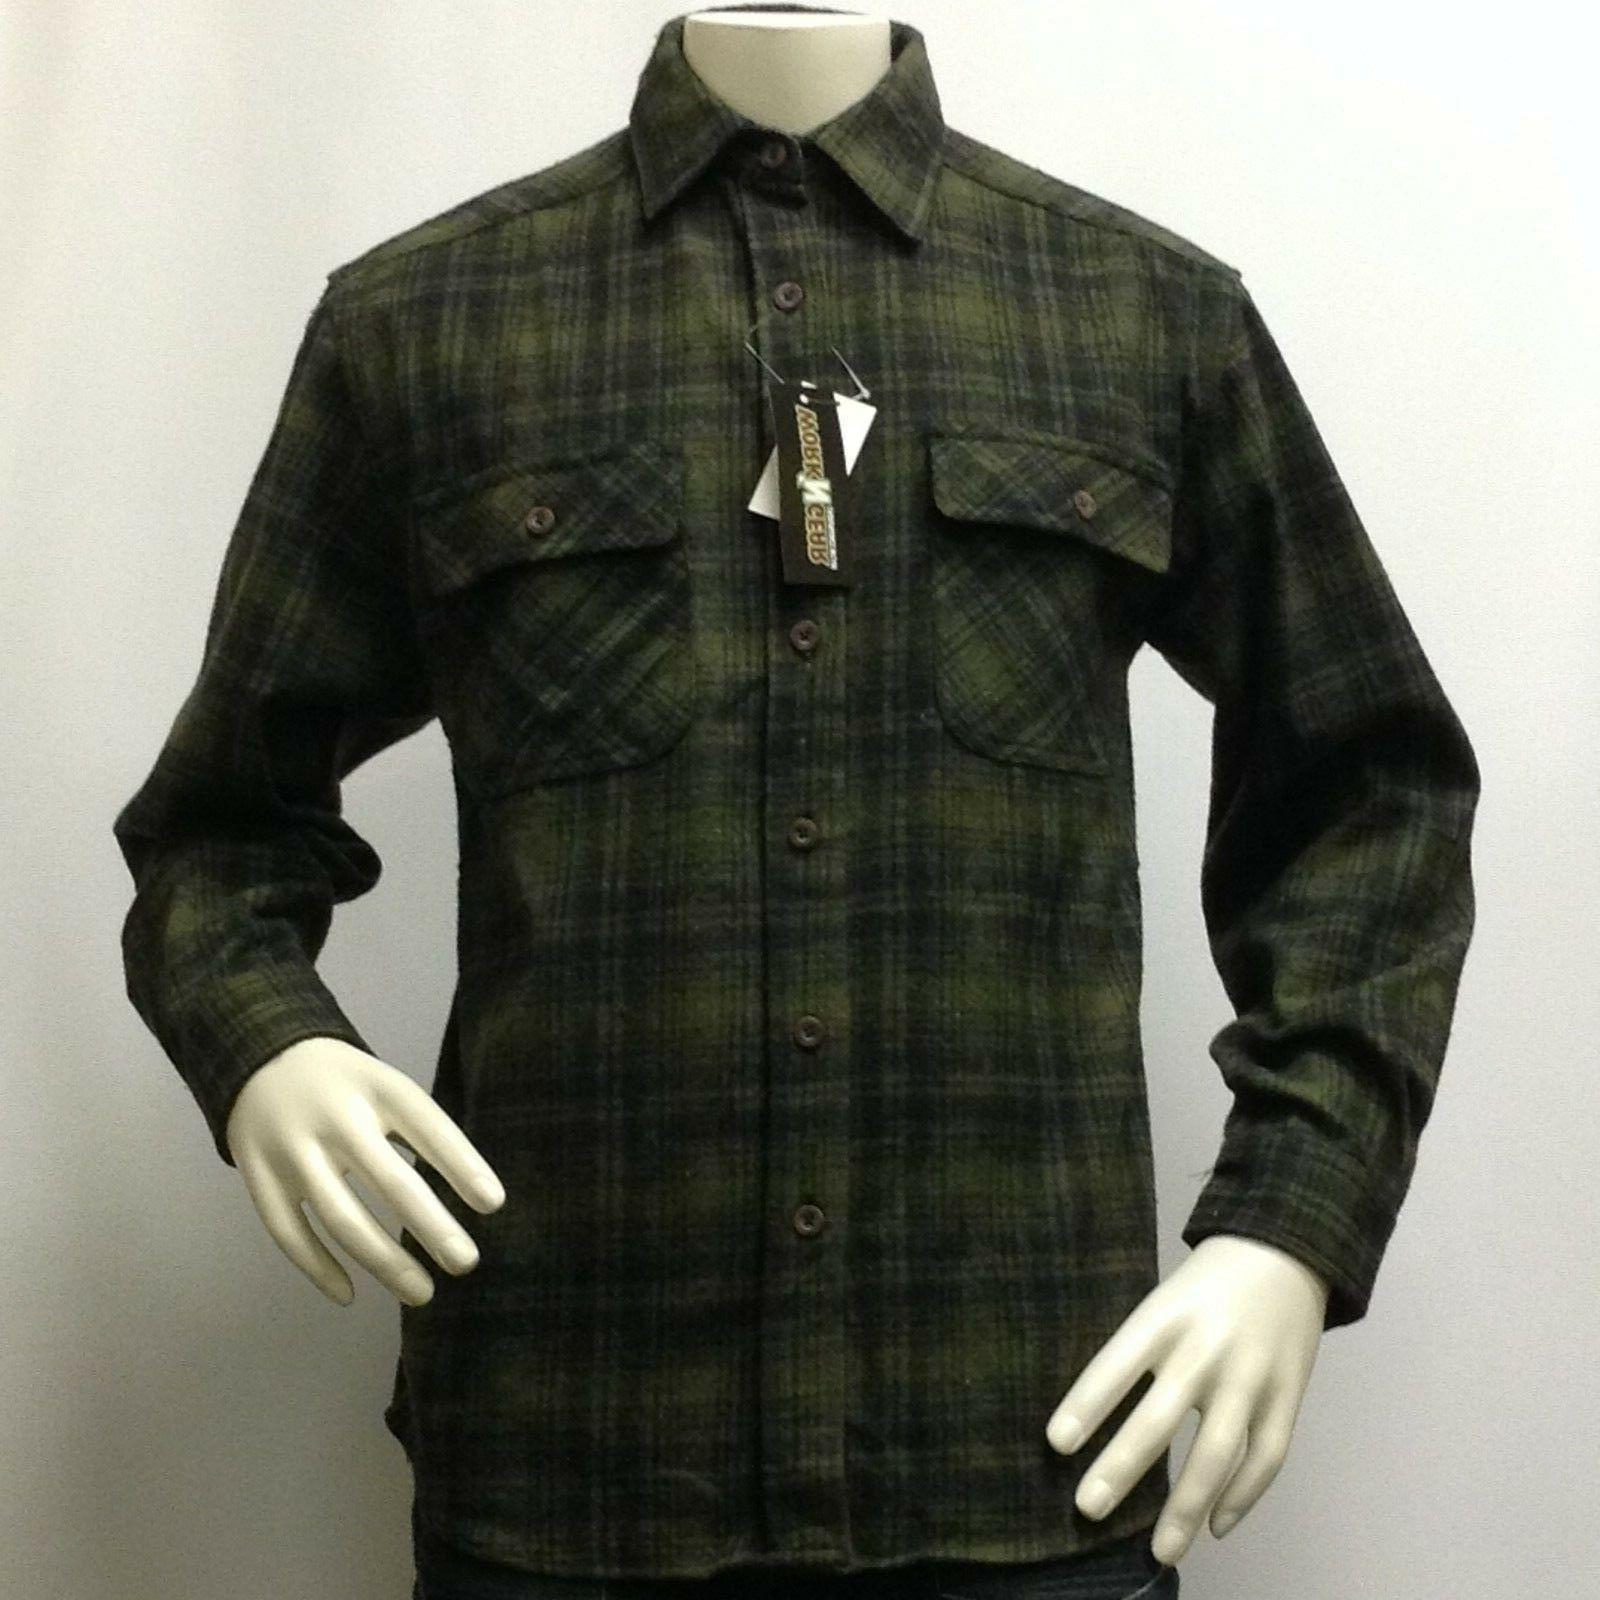 "Men's Flannel Shirt Very Heavy Jacket Size Gear"" &Olive"